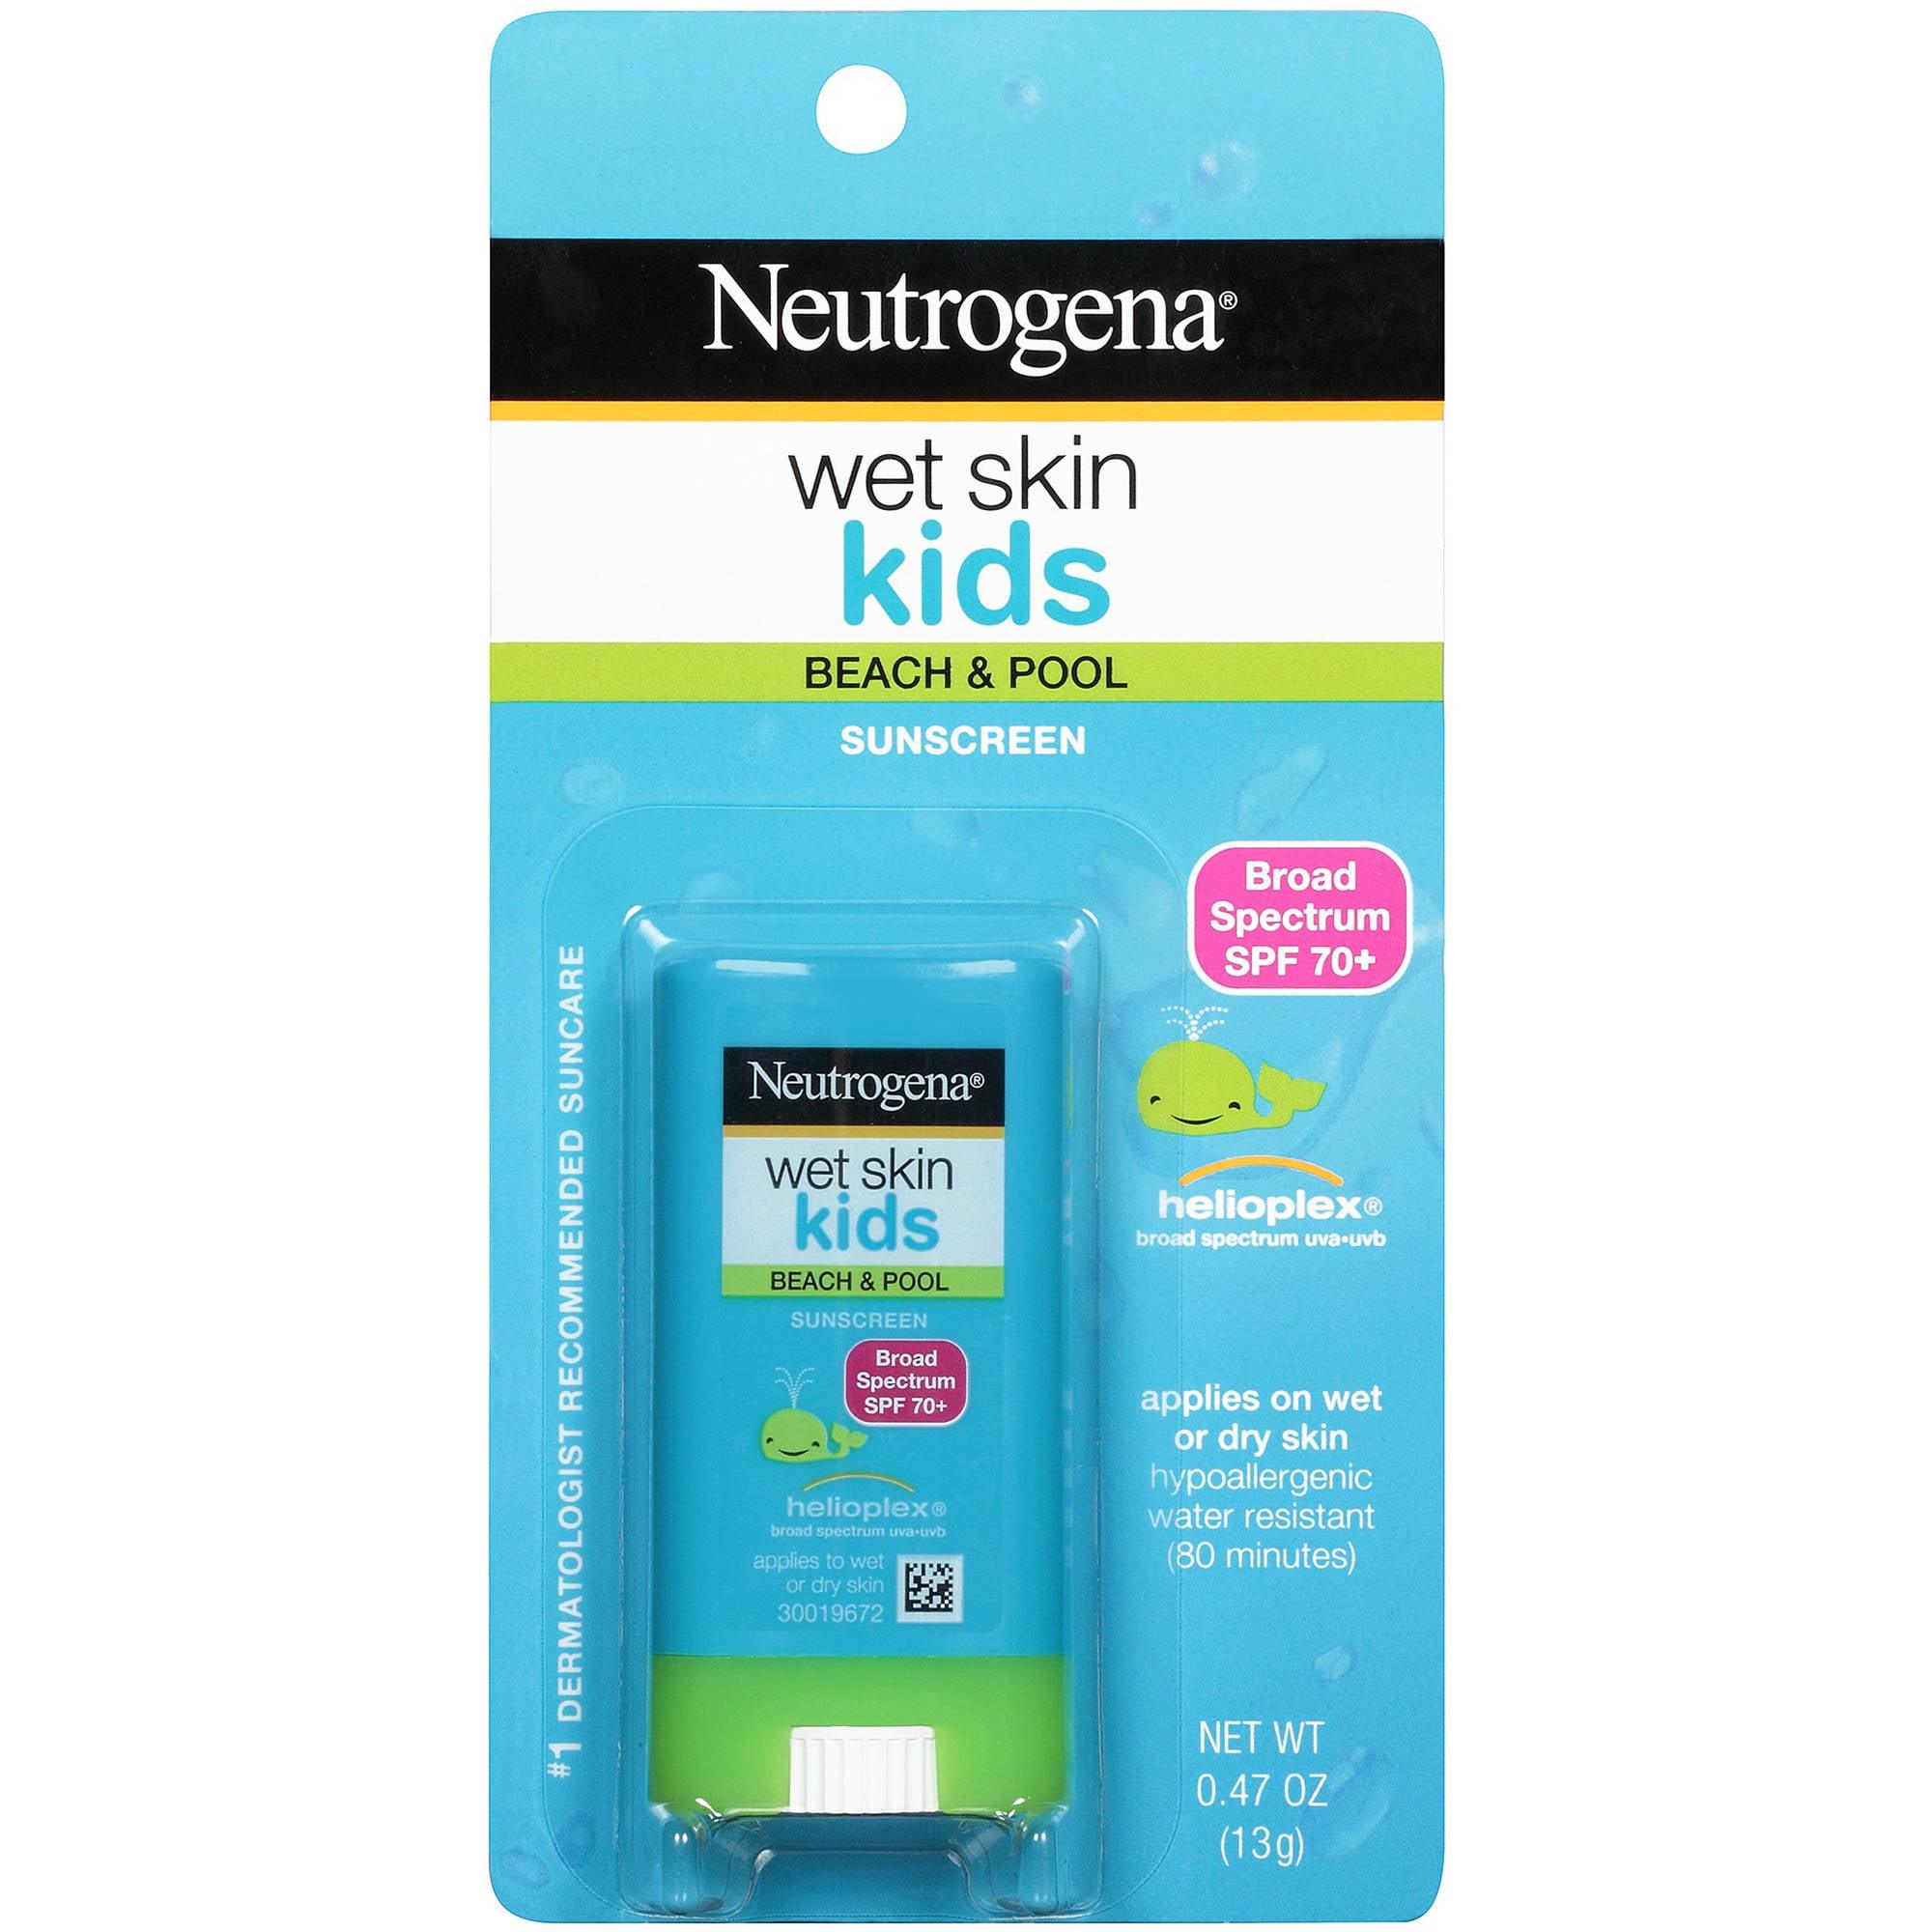 Neutrogena Wet Skin Kids Stick Sunscreen Broad Spectrum SPF 70, 0.47 oz